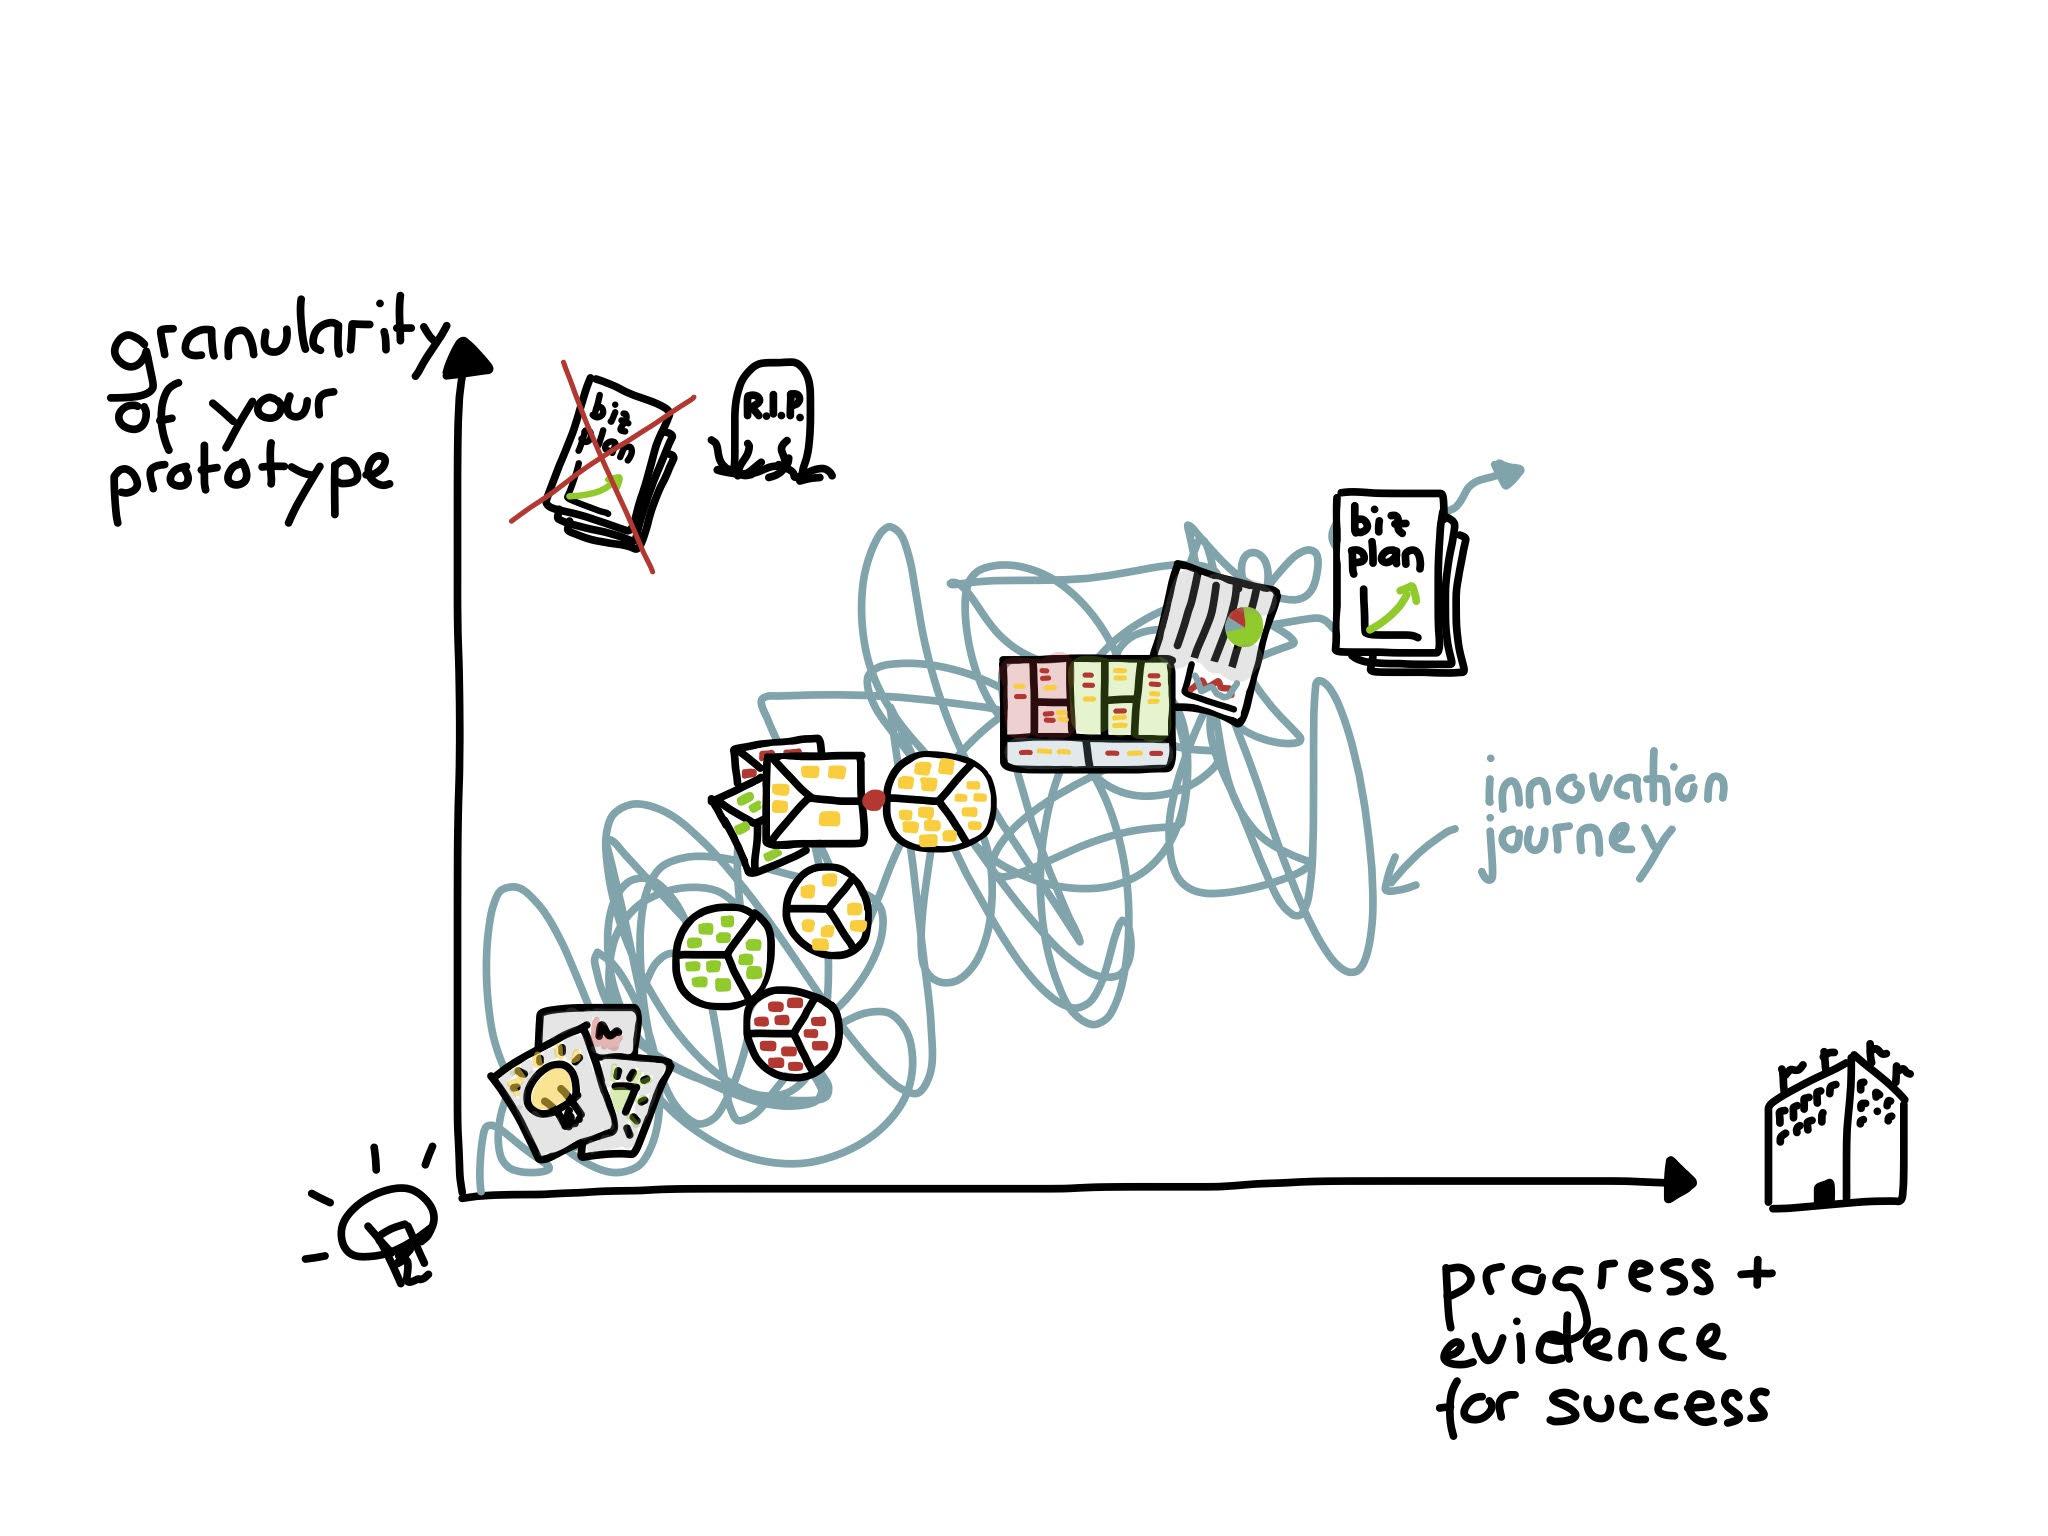 Strategyzer_Alex_Osterwalder_Prototypes